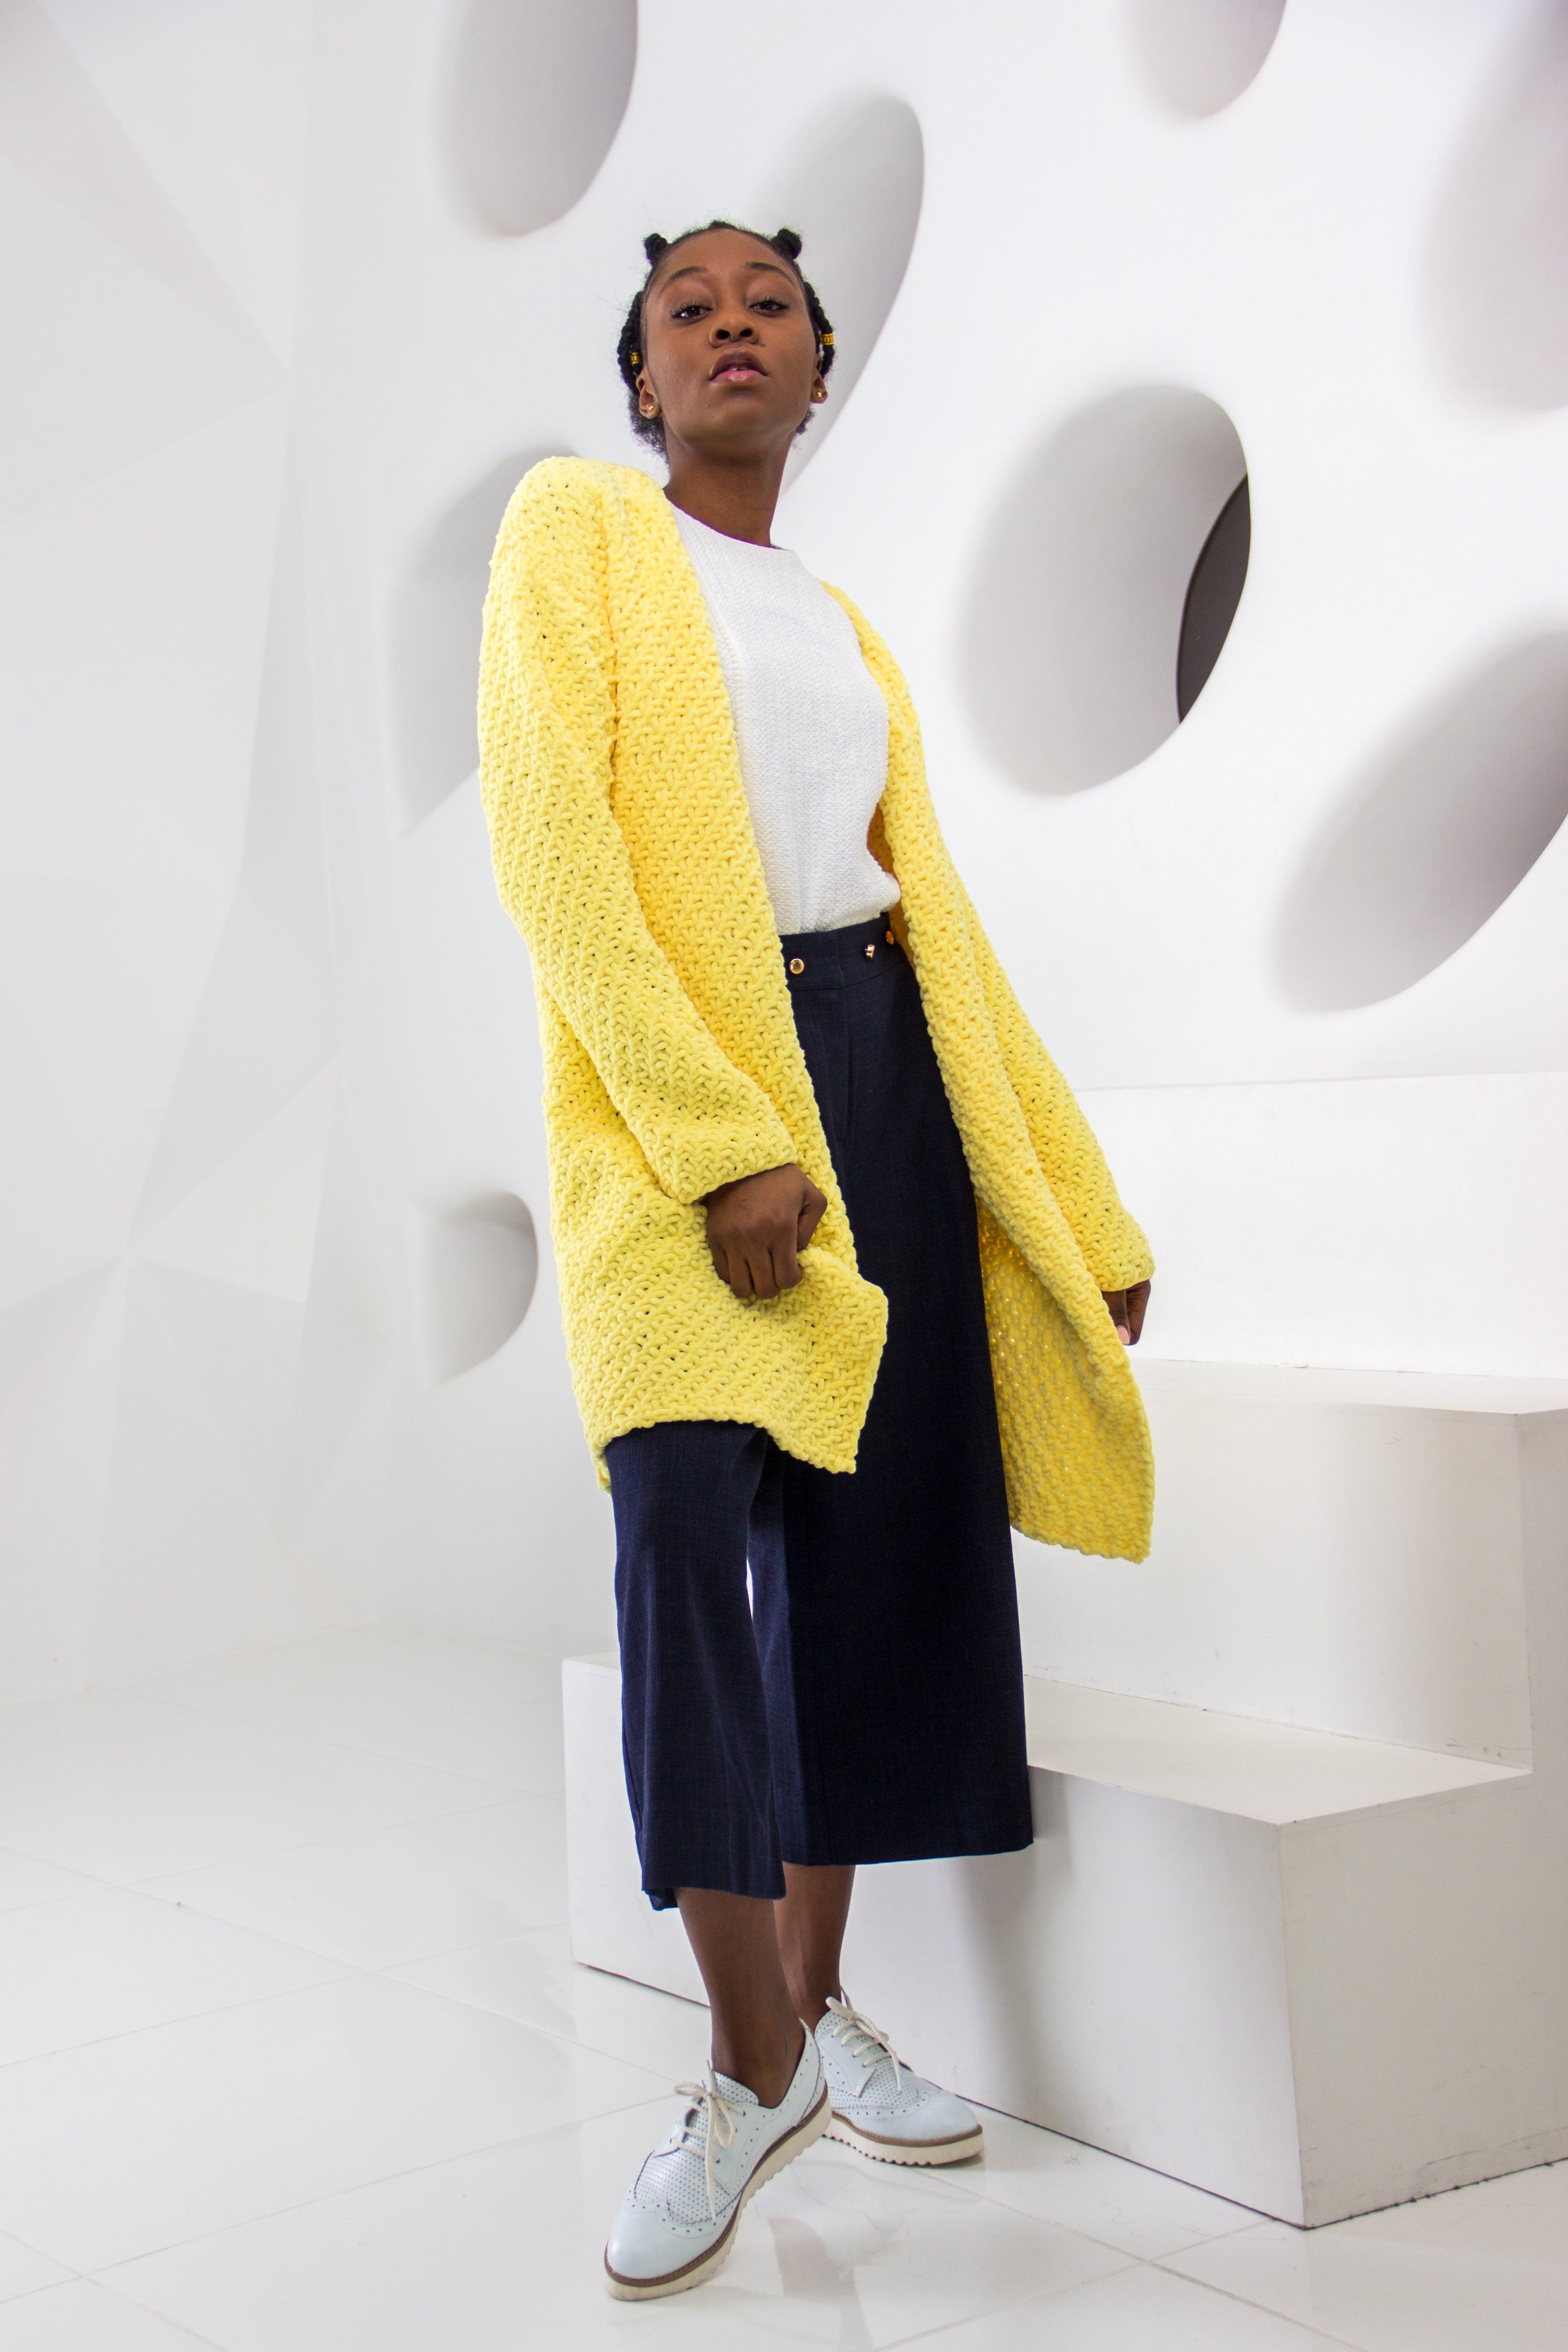 Woman Wearing Yellow Knit Cardigan Standing